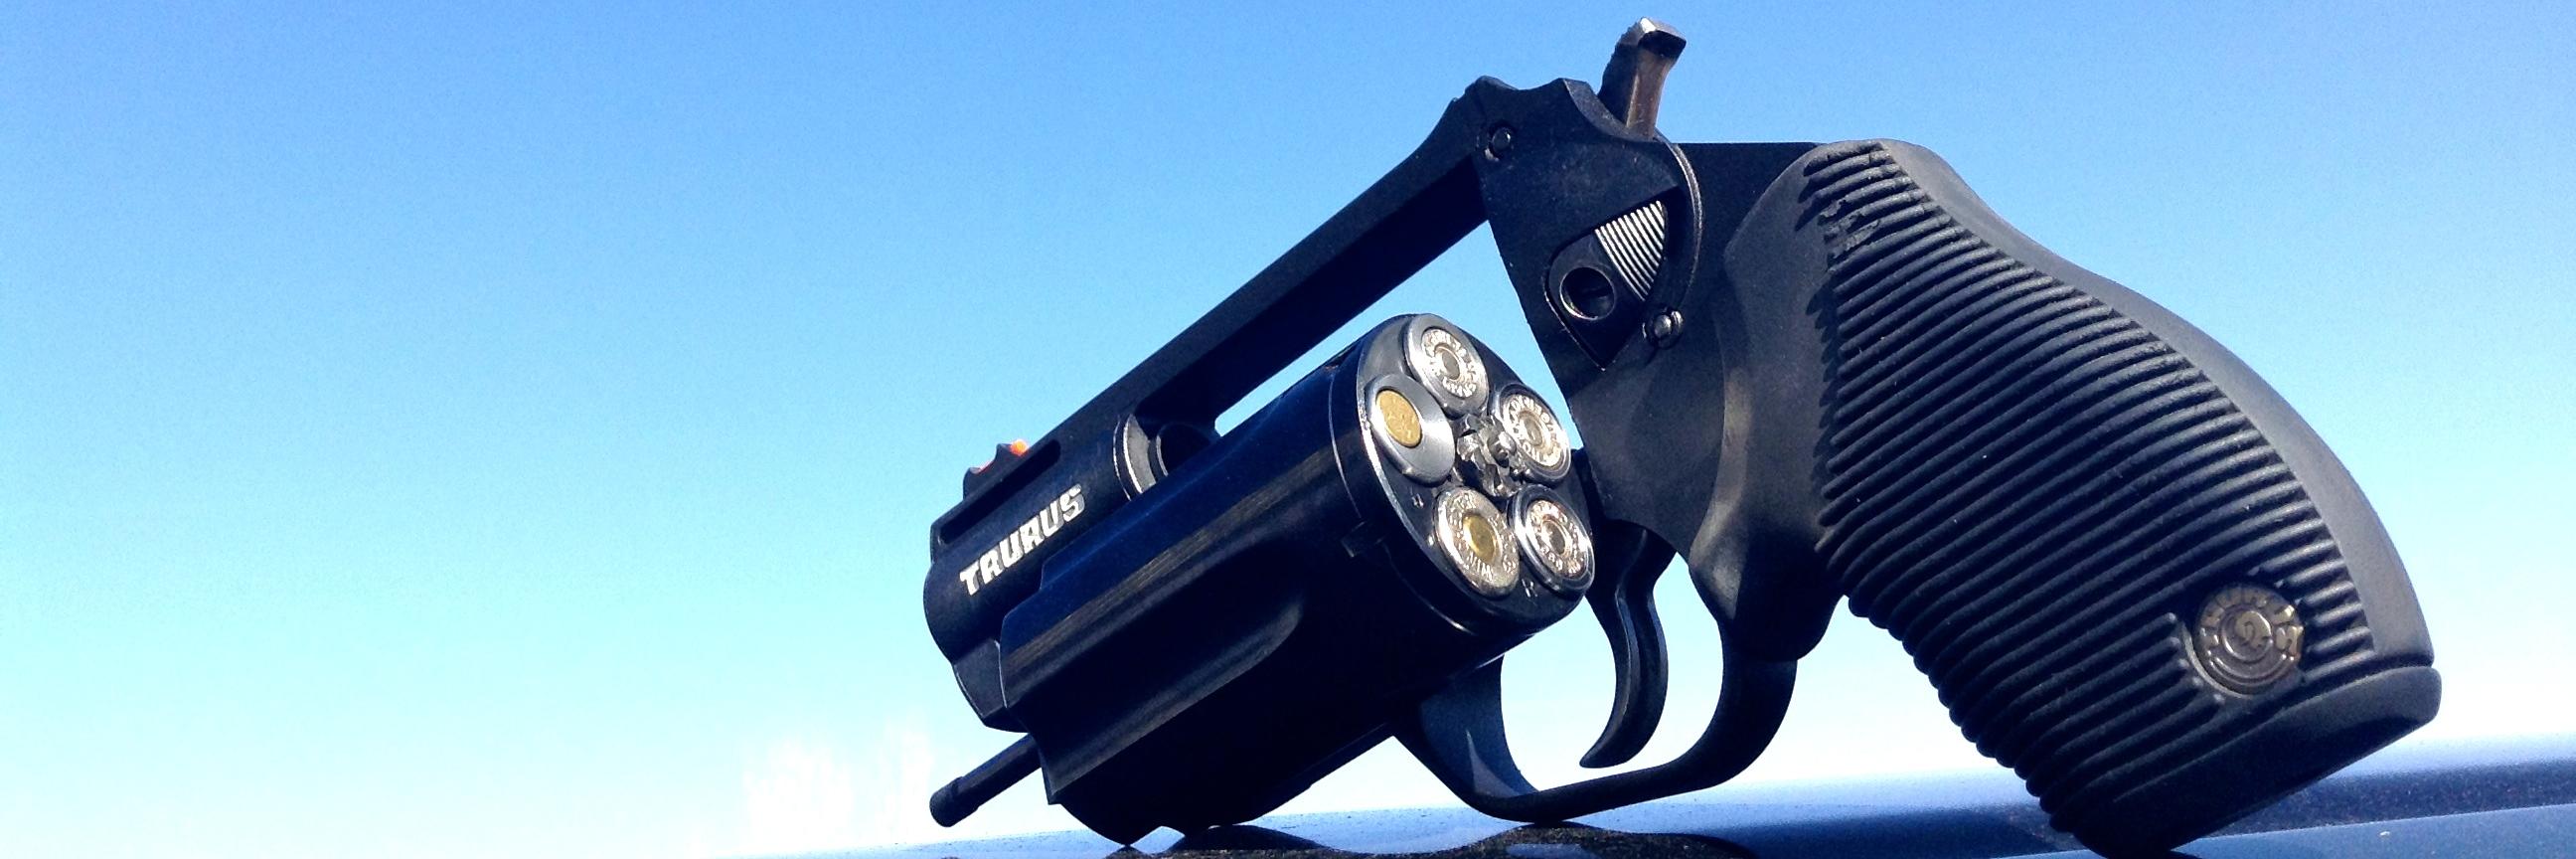 Taurus Judge Adapters - Shop Today!